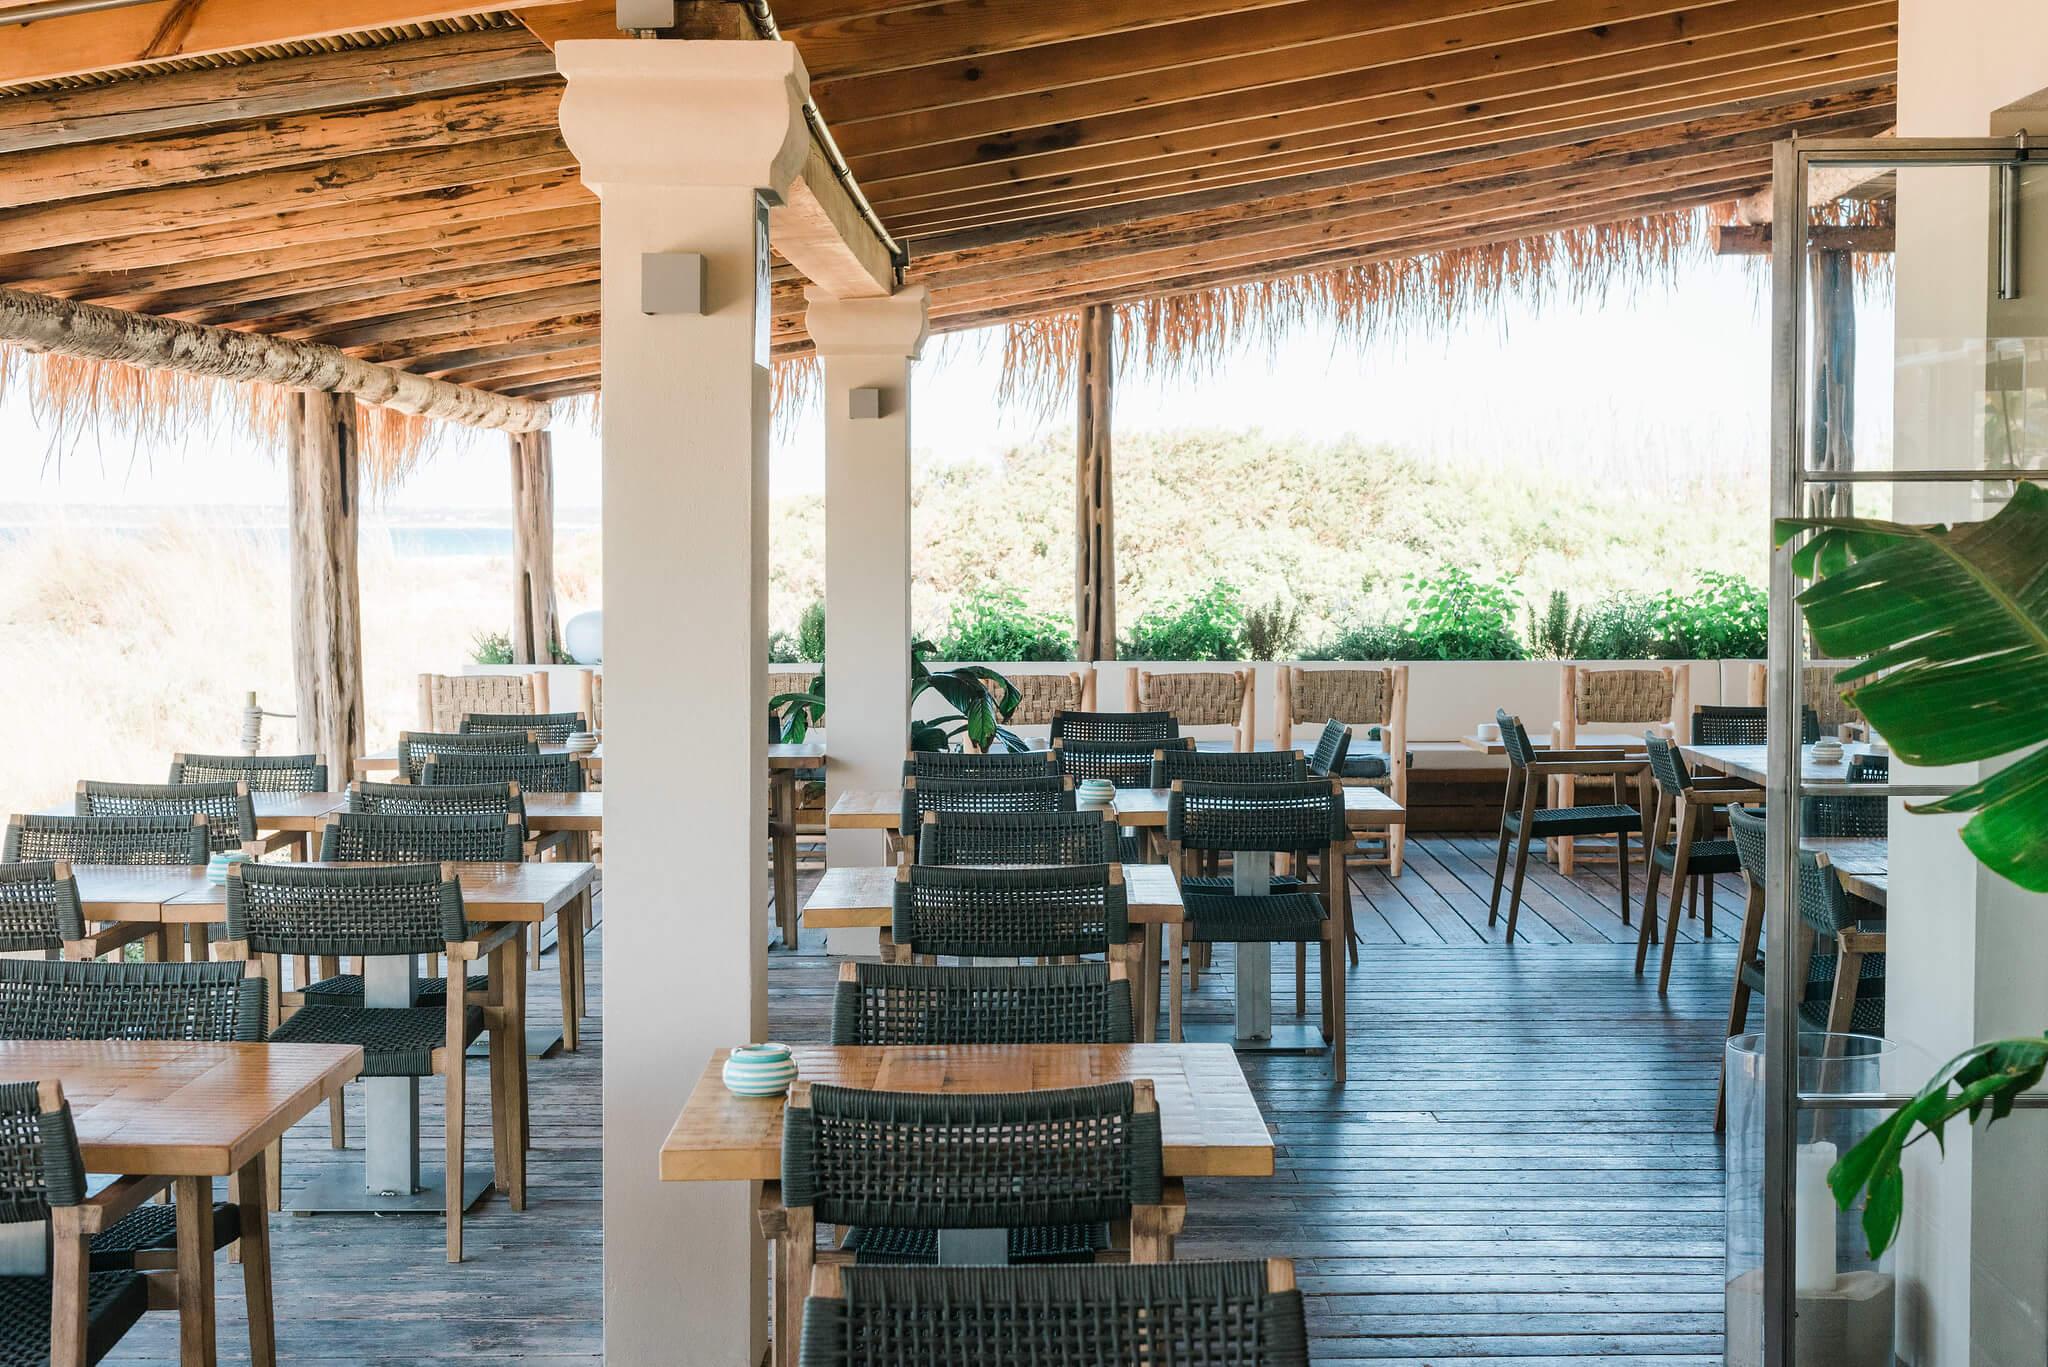 https://www.white-ibiza.com/wp-content/uploads/2020/03/formentera-beach-restaurants-flipper-2020-04.jpg